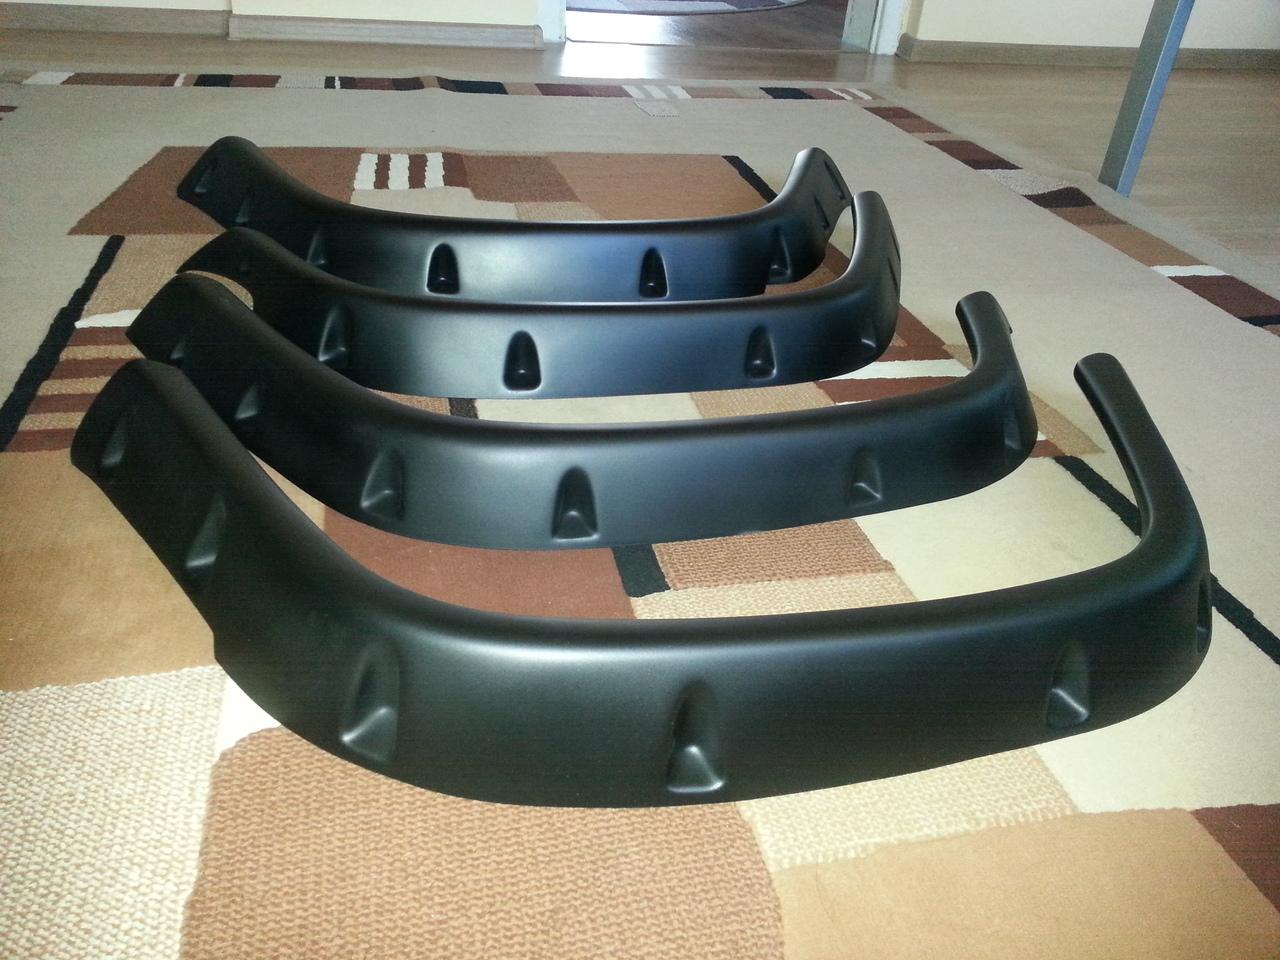 PROMOTIE!!!de vanzare set overfendere aripi +snorkel suzuki vitara acuma la 700 ron